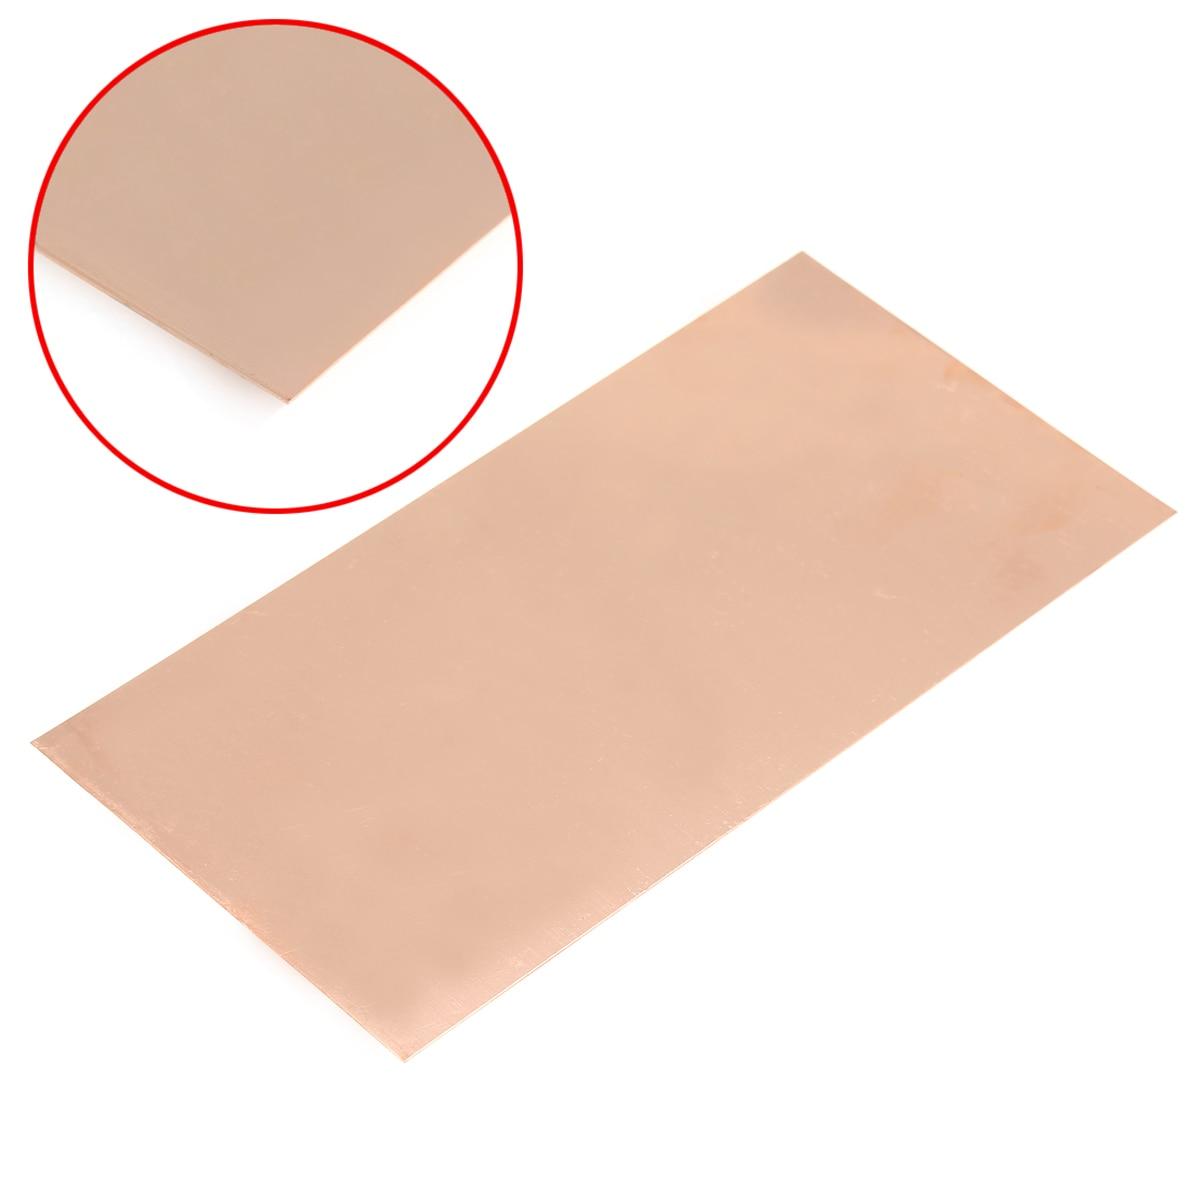 DWZ 1pc 99.9% Pure Copper Cu Metal Sheet Plate Foil Panel 100*200*0.5MM 1pc high purity copper plate cu metal foil sheet 0 1x200x1000mm best price for power tool accessories